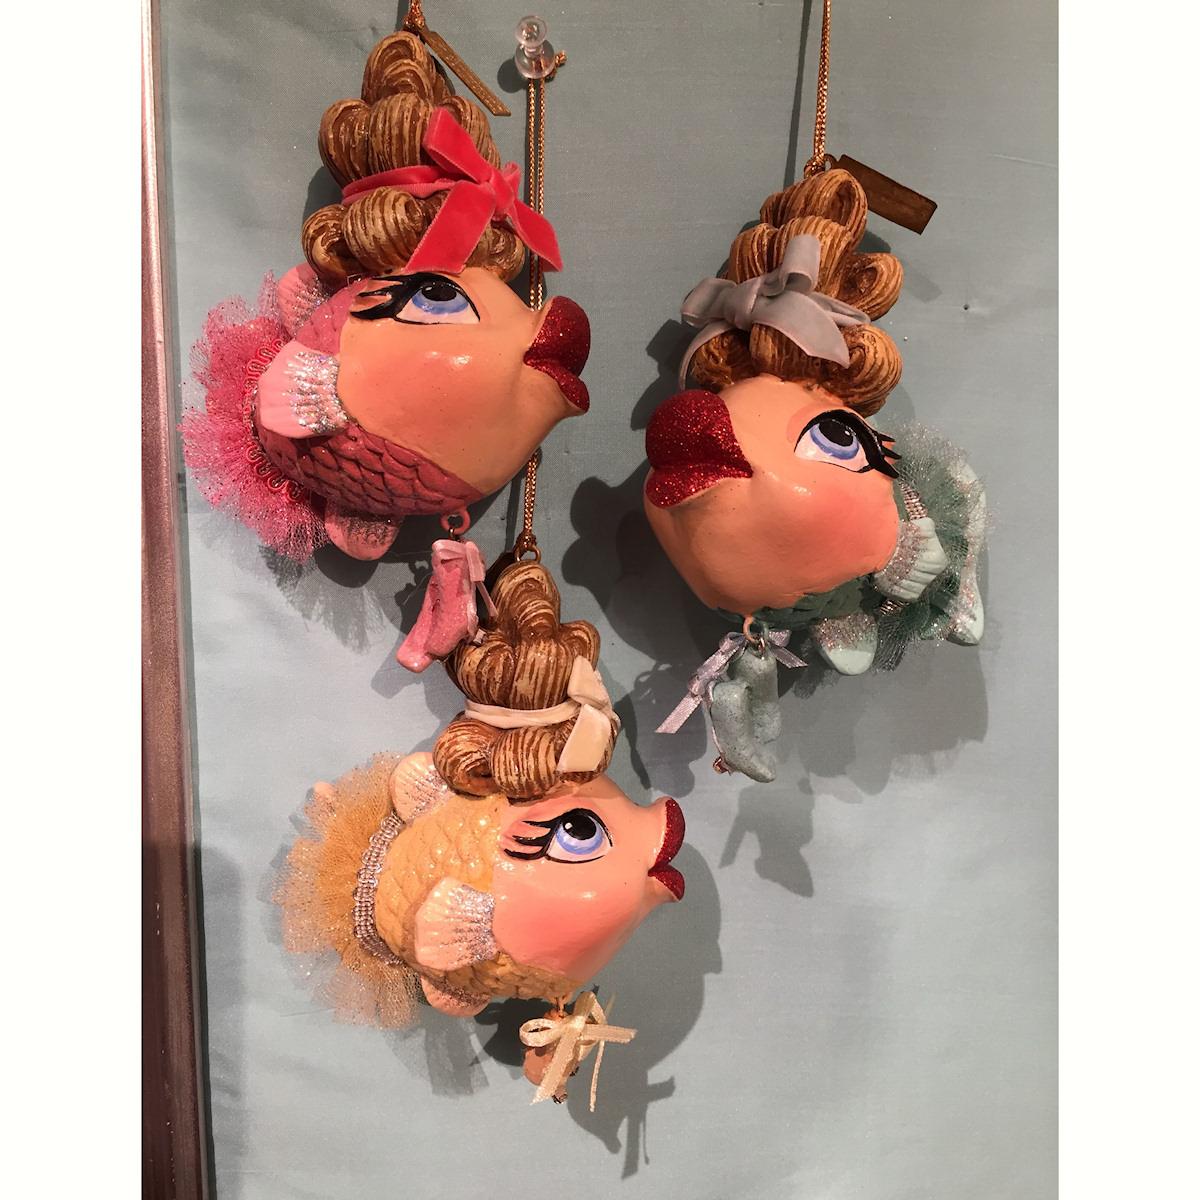 Kissing fish ornament - Ballerina Kissing Fish Ornaments New Just Arrived Happy Holidayware